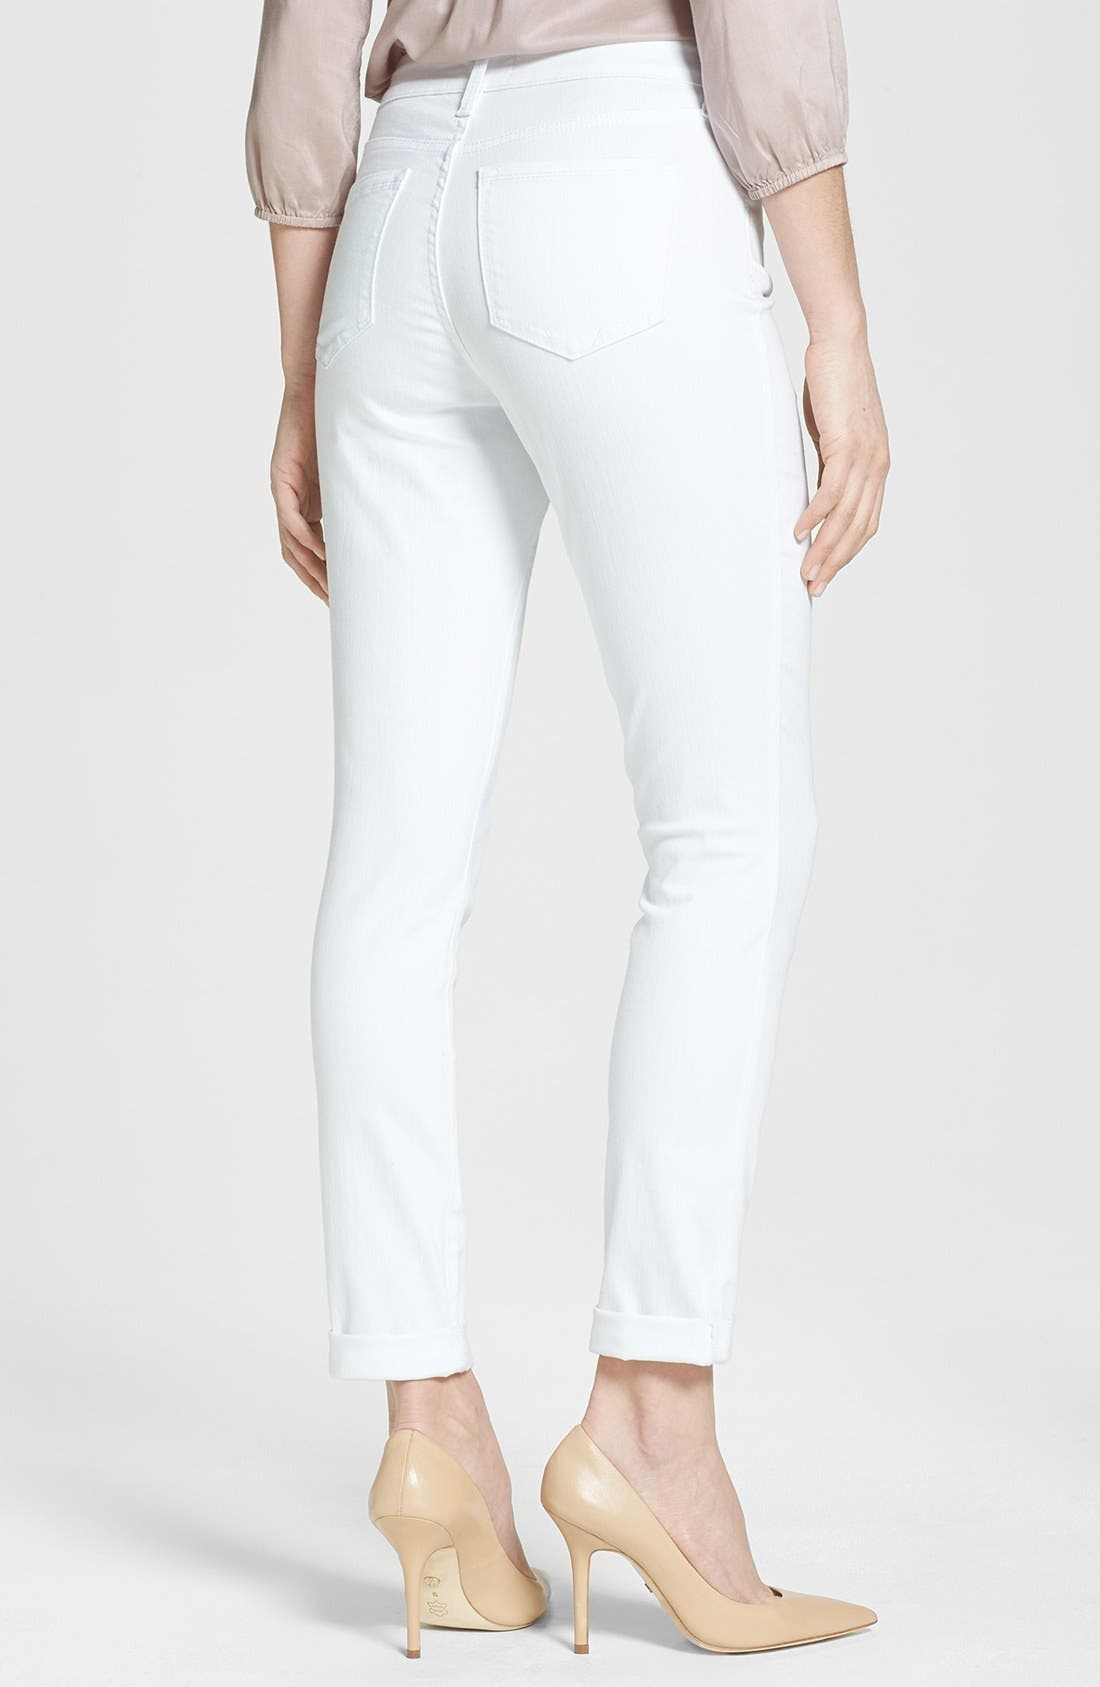 Alternate Image 2  - NYDJ 'Anabelle' Stretch Skinny Jeans (Optic White)